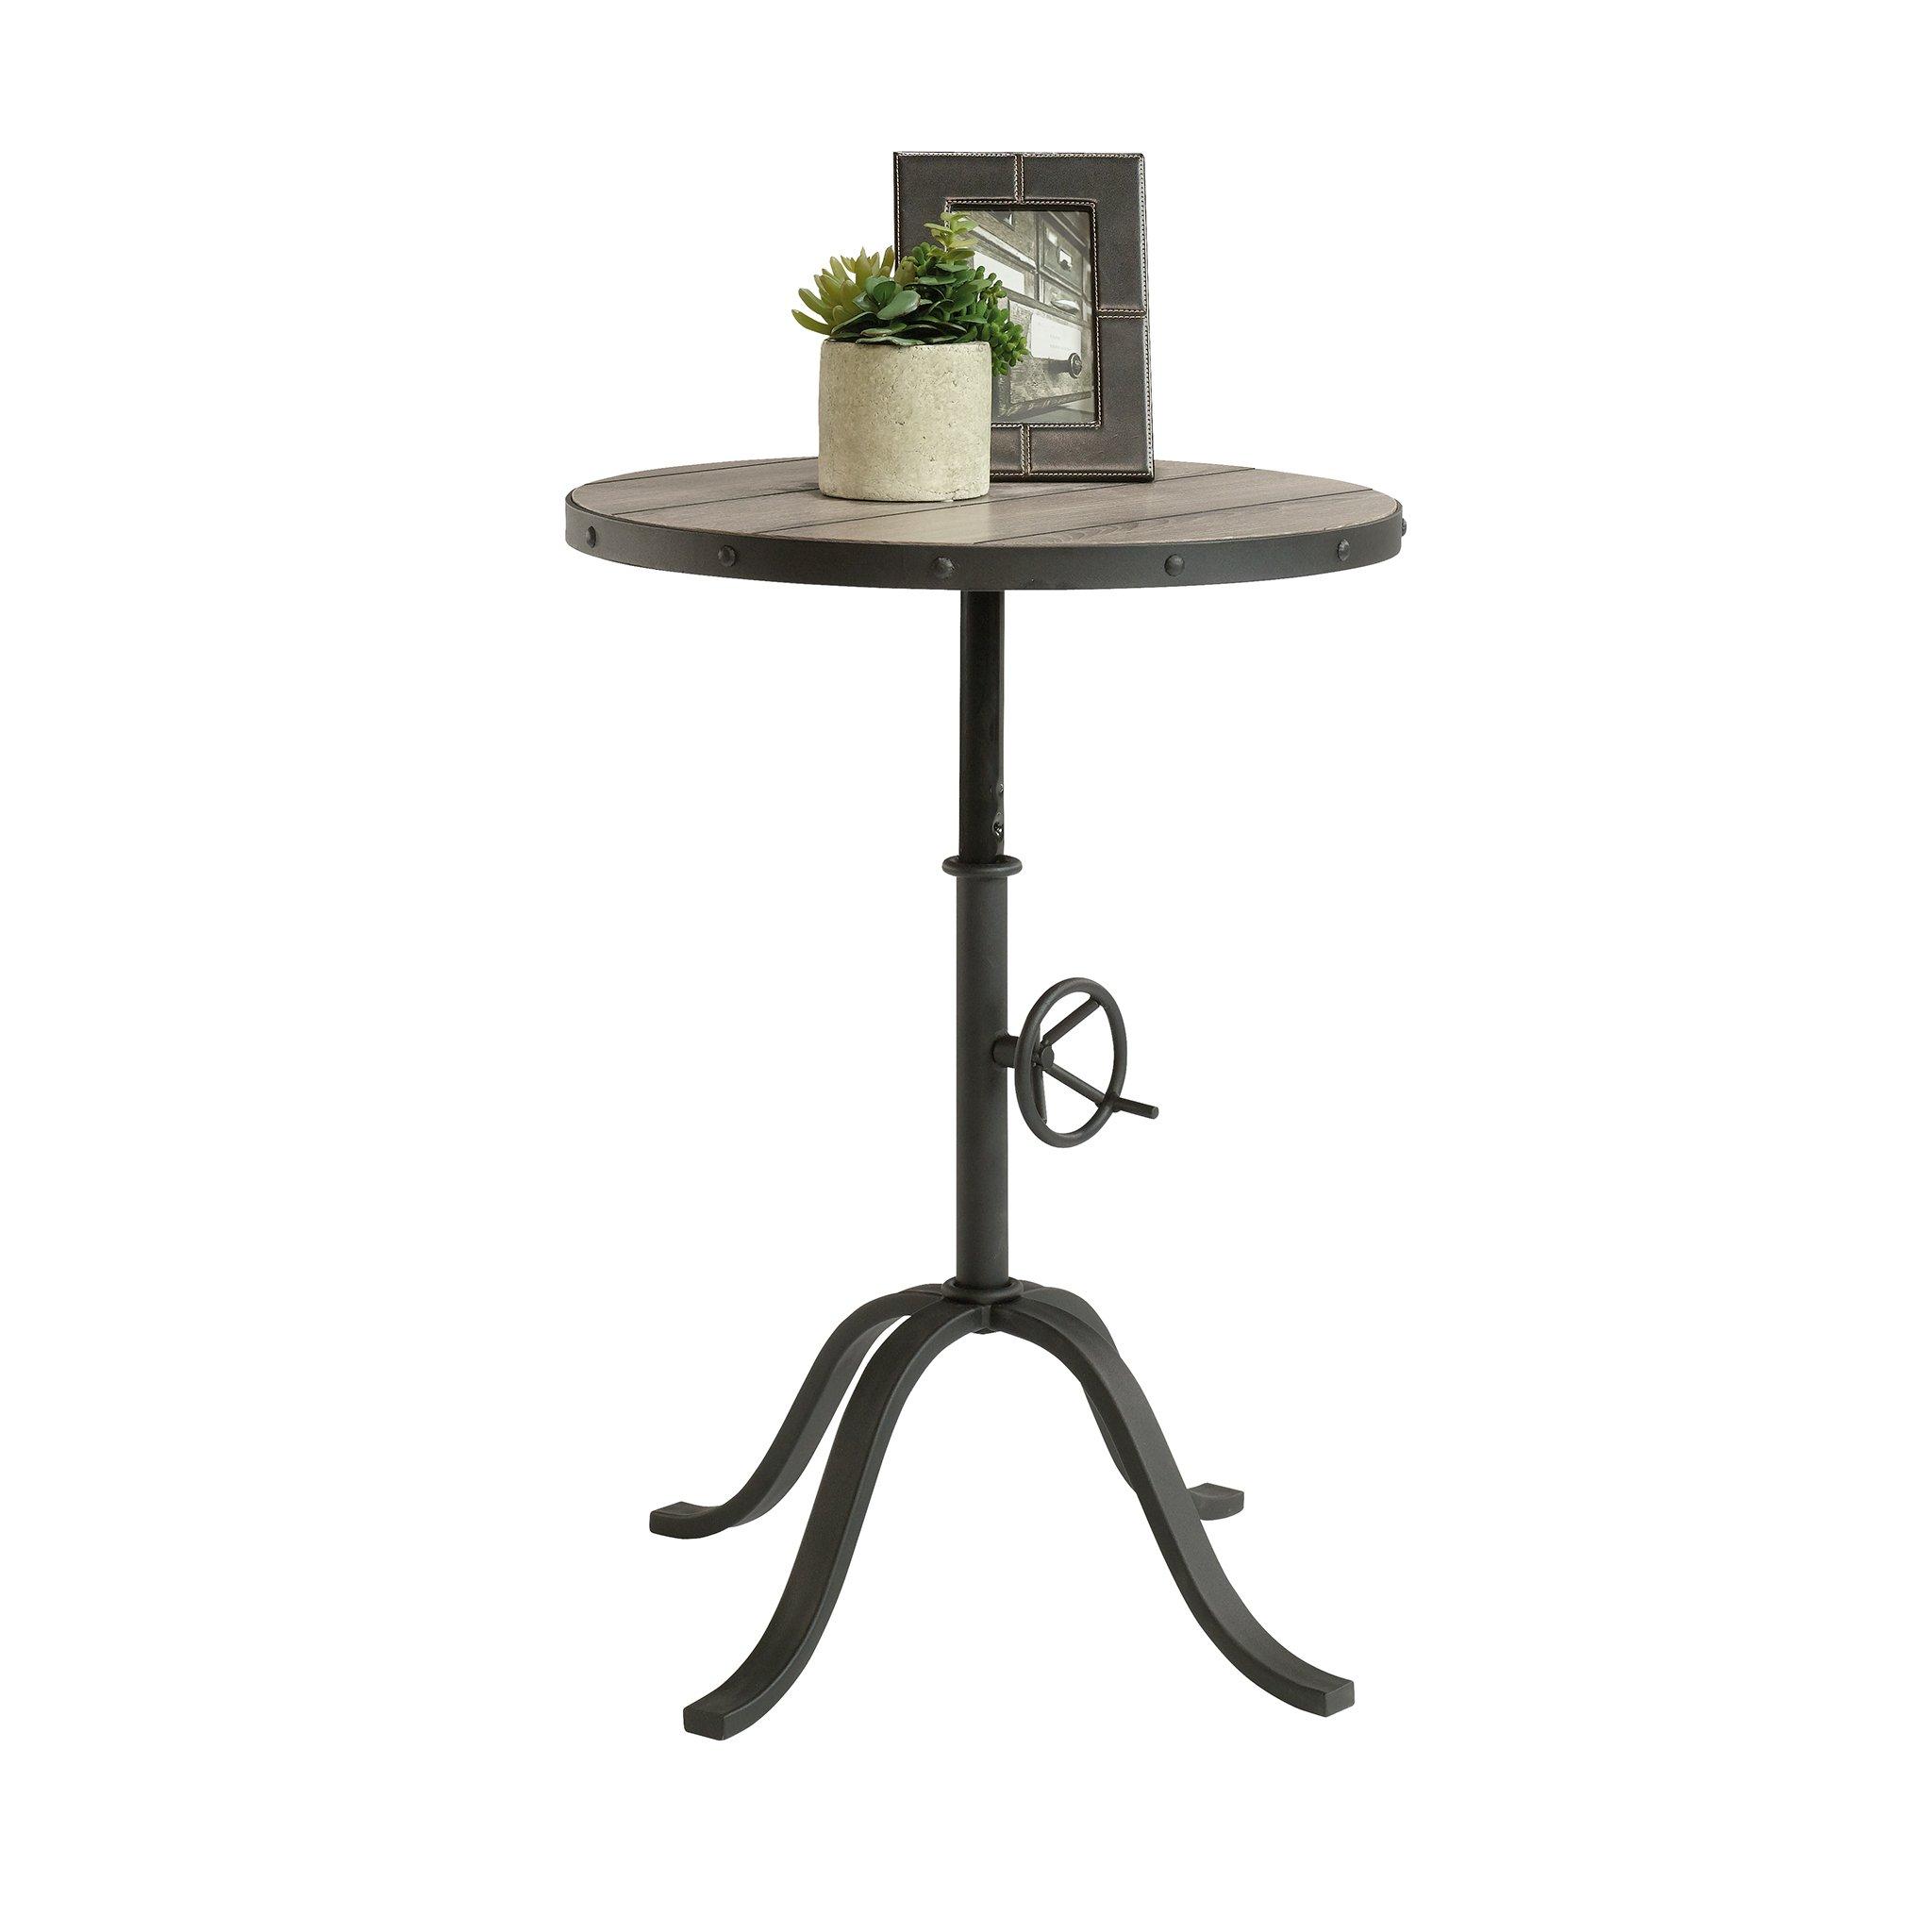 Sauder 417064 Barrister Lane Pedestal Table, L: 20.236'' x W: 20.236'' x H: 26.378'', Mixed finish by Sauder